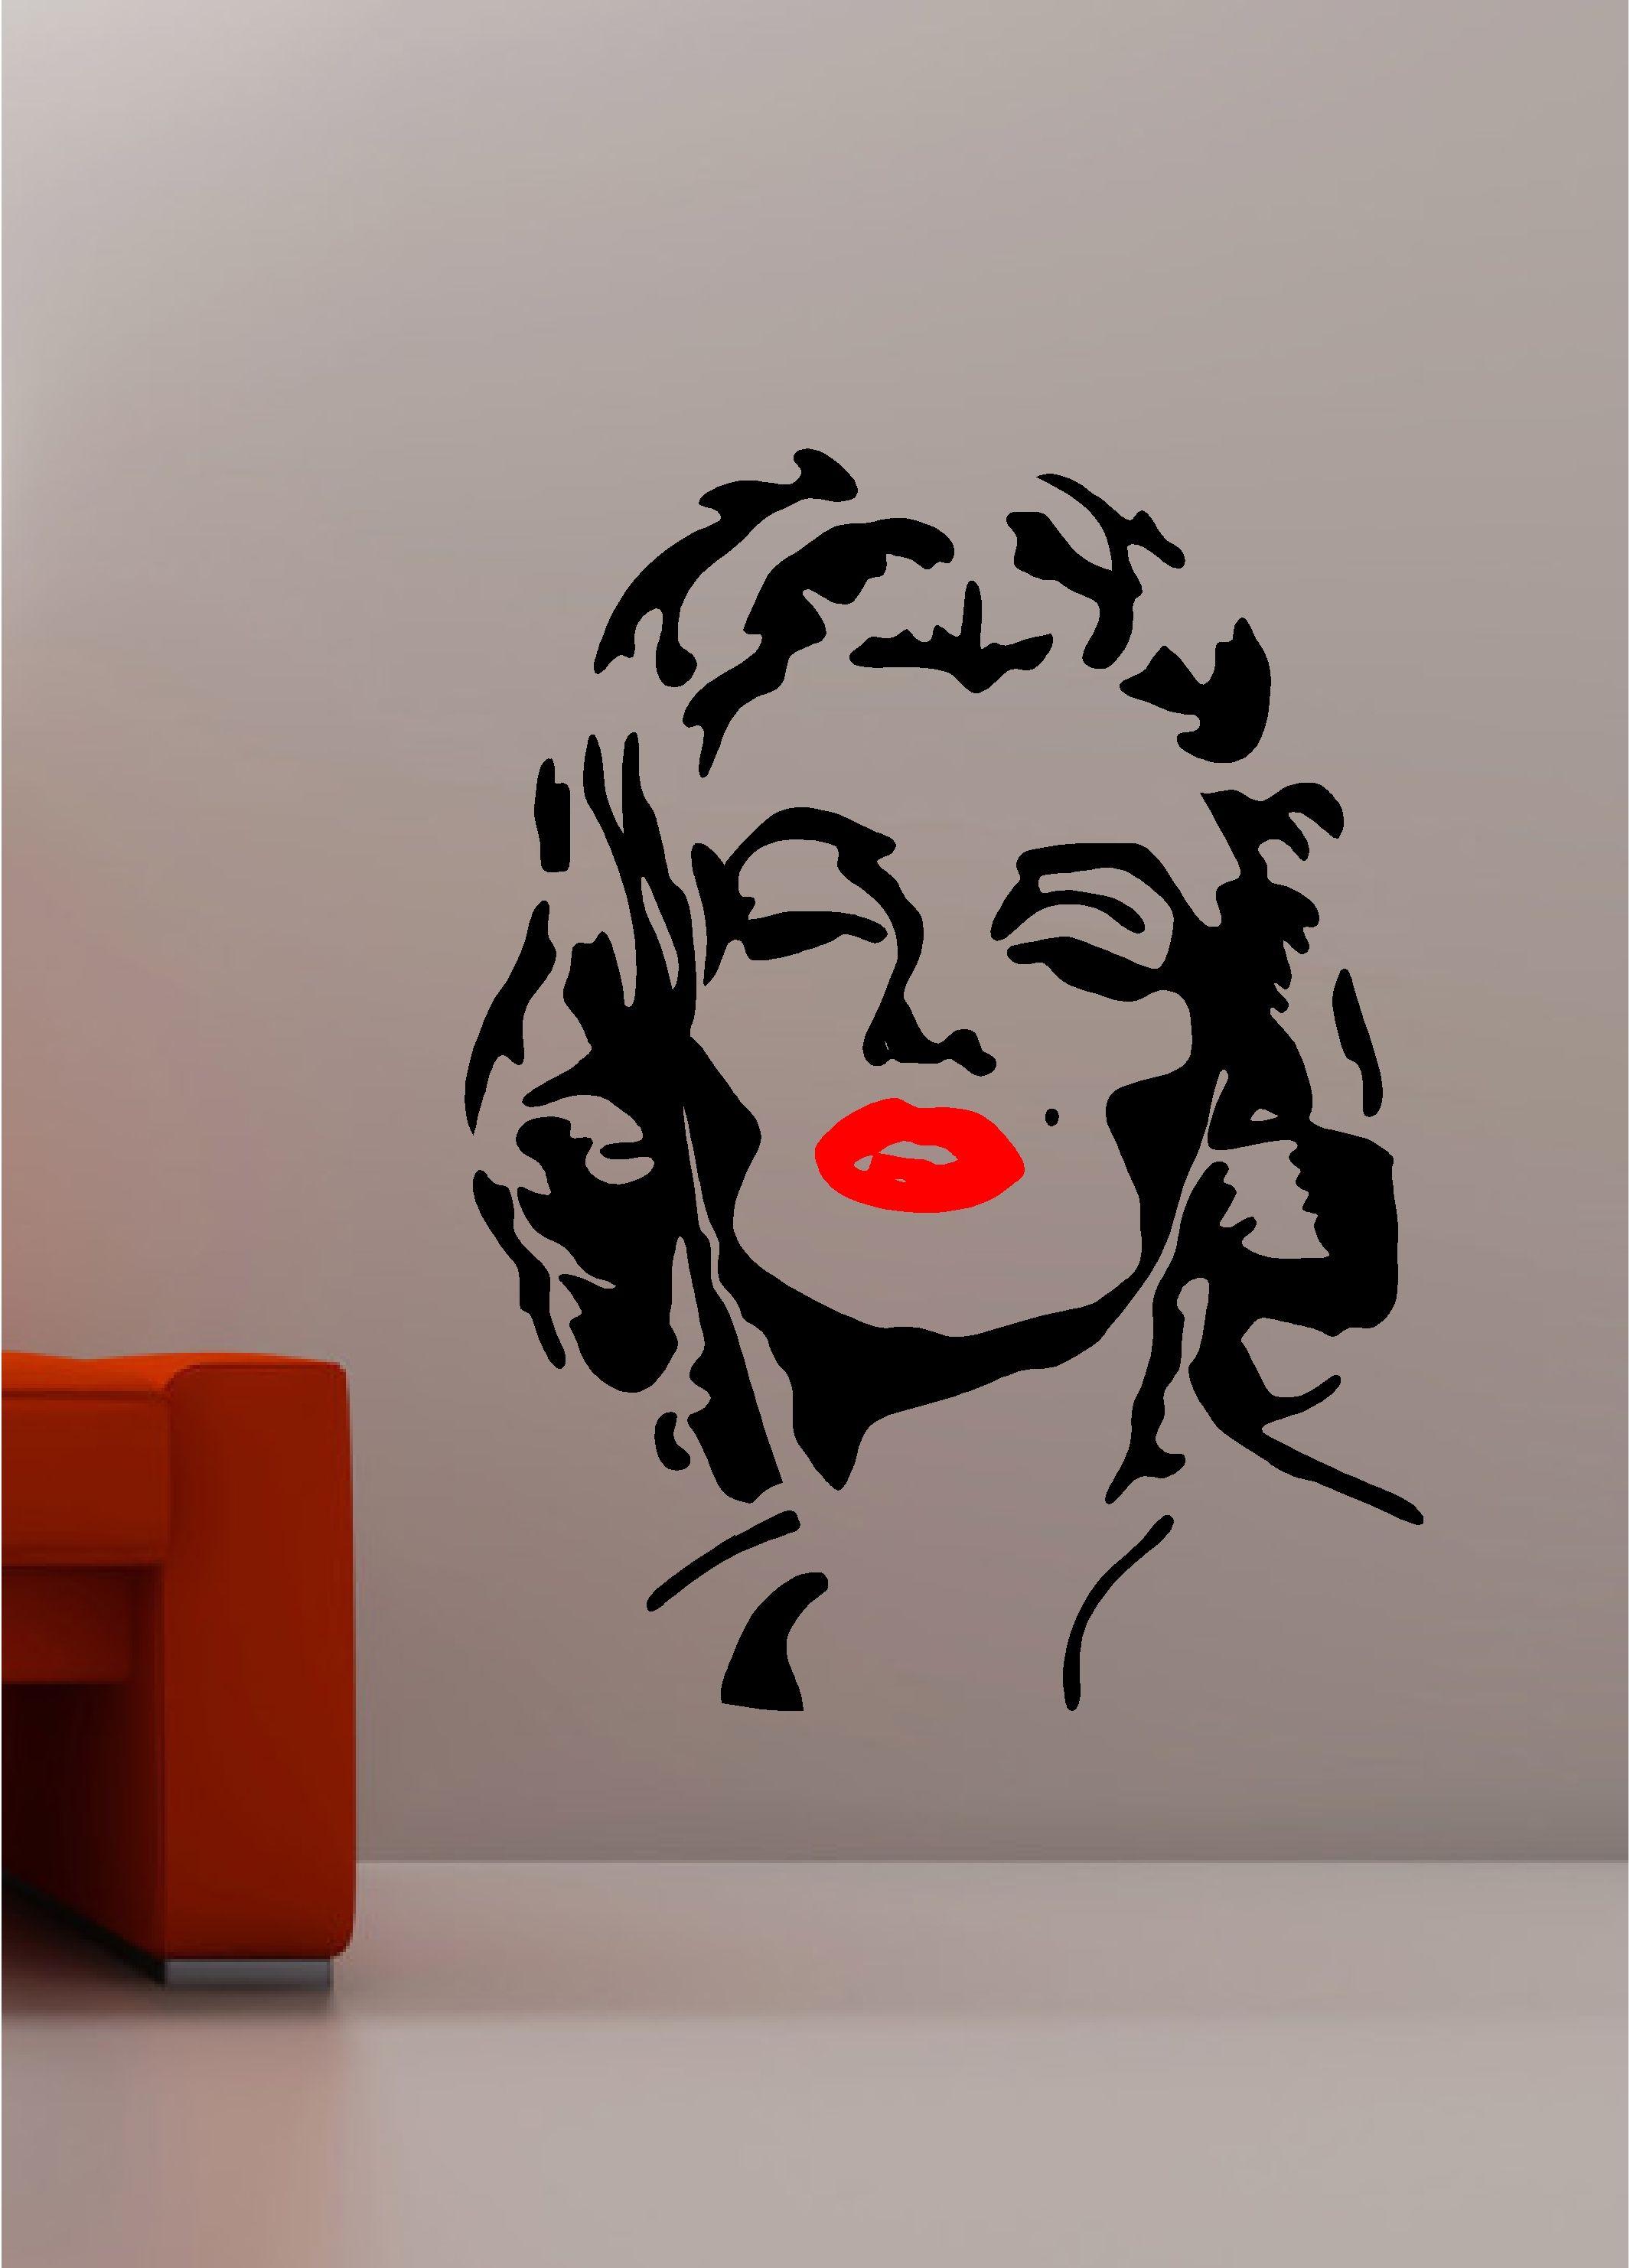 Marilyn monroe pop art wall art quote sticker vinyl kitchen lounge bedroom lips painting pop - Sticker on wall decor ...